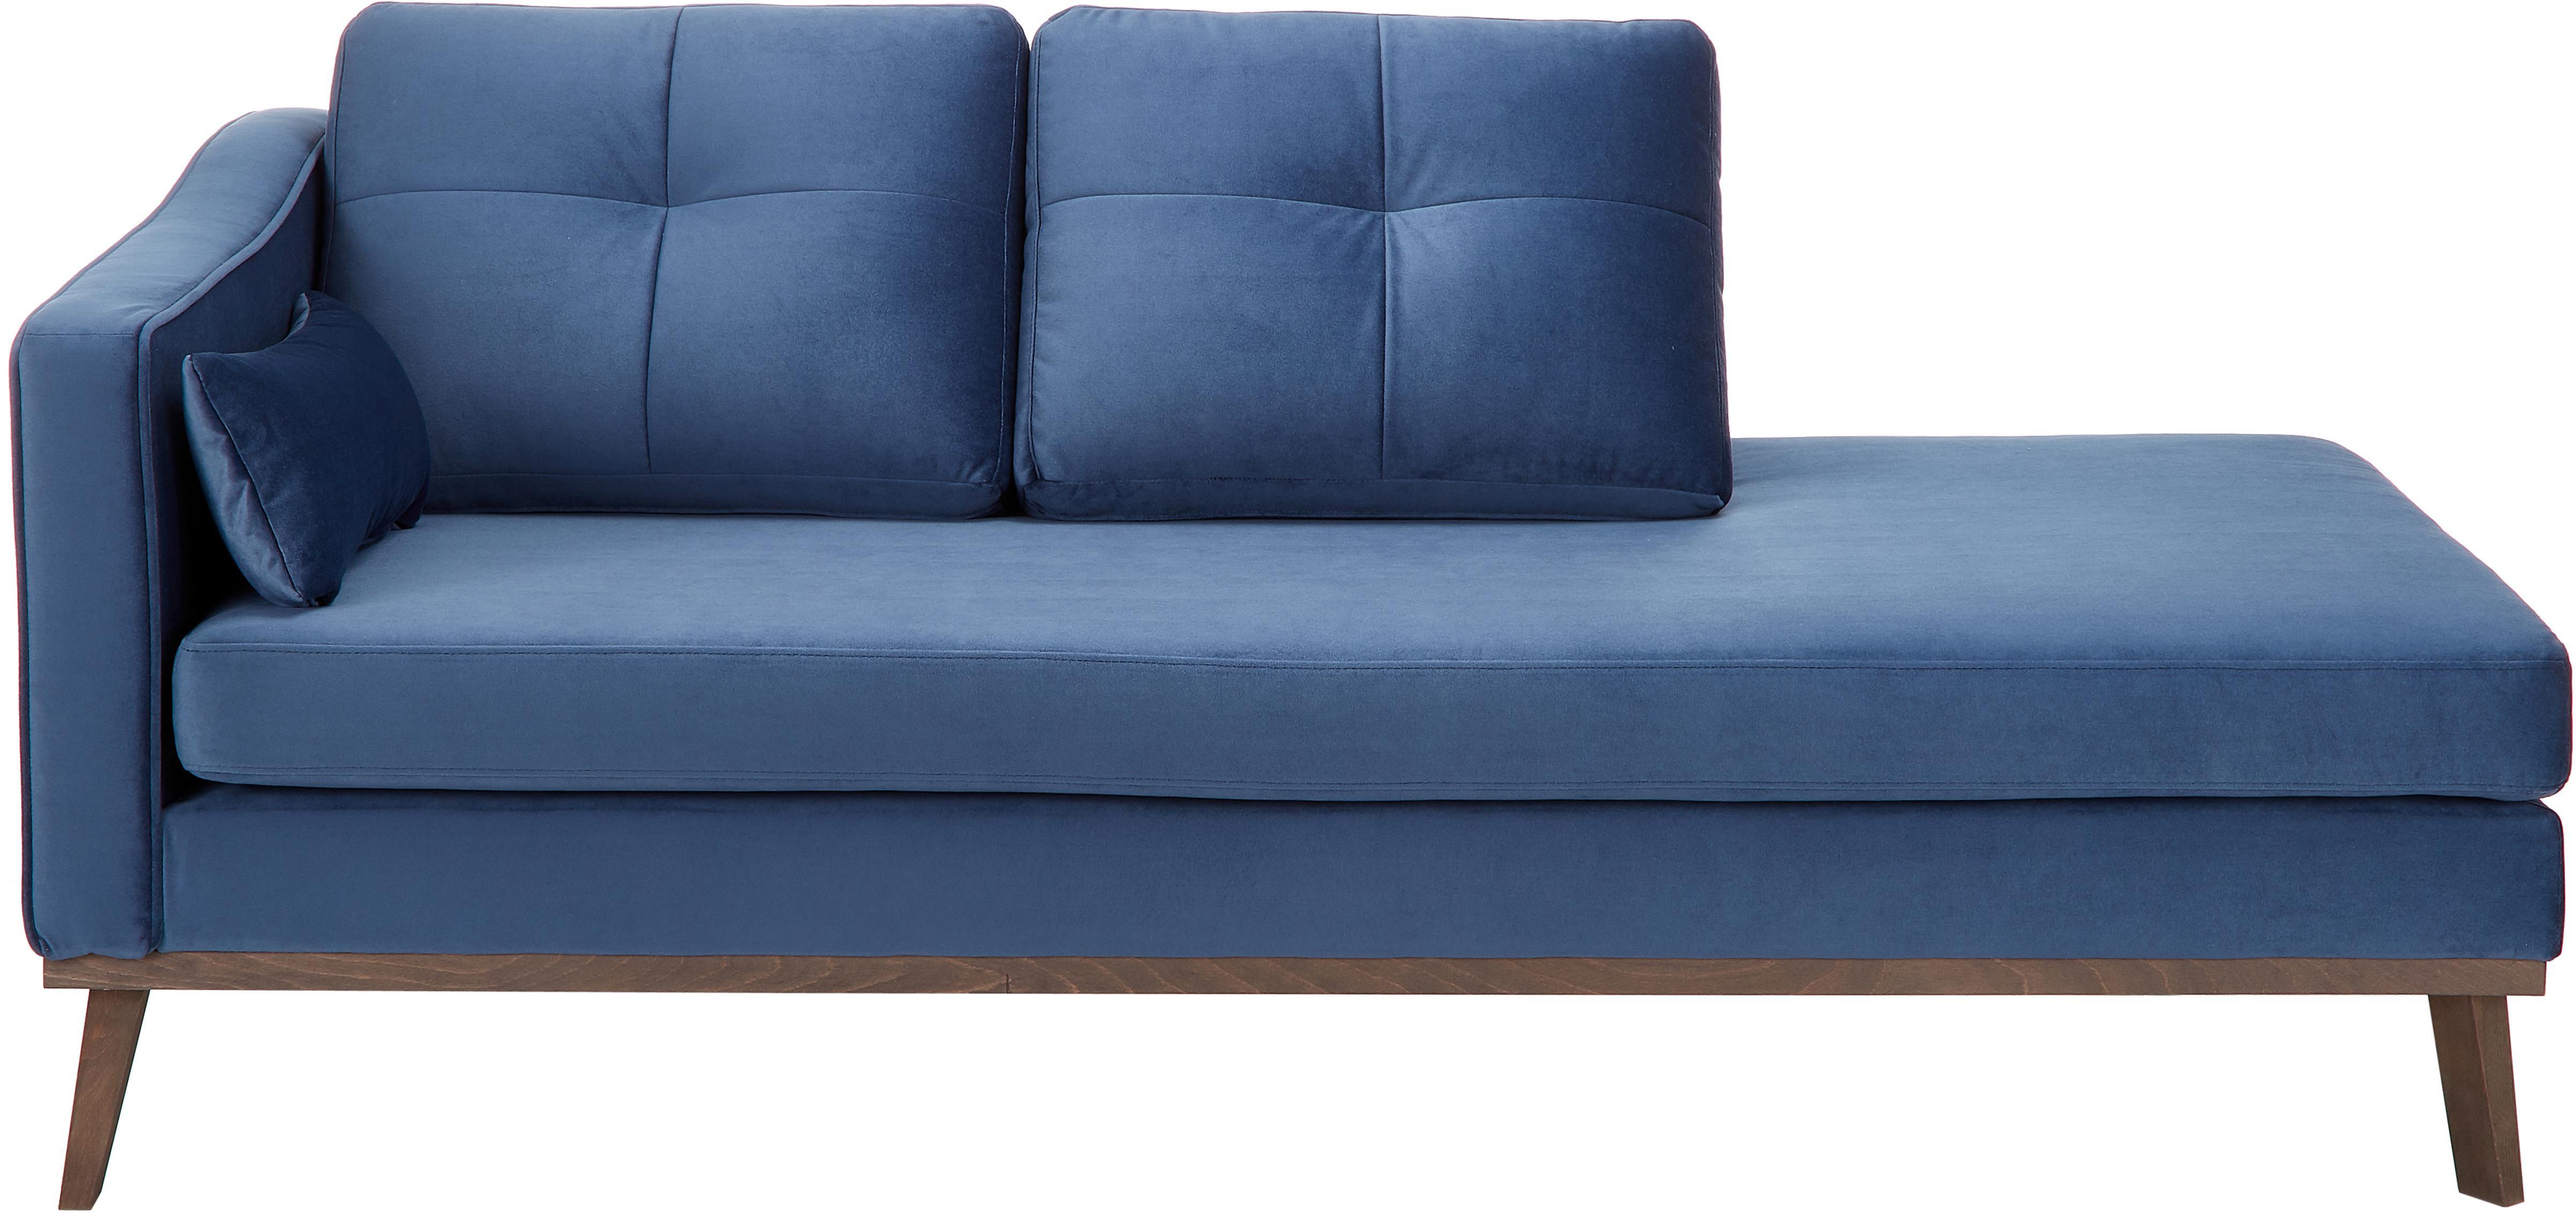 Fluwelen chaise longue Alva, Bekleding: fluweel (hoogwaardig poly, Frame: massief grenenhout, Poten: massief beukenhout gebeit, Fluweel donkerblauw, B 193 x D 94 cm